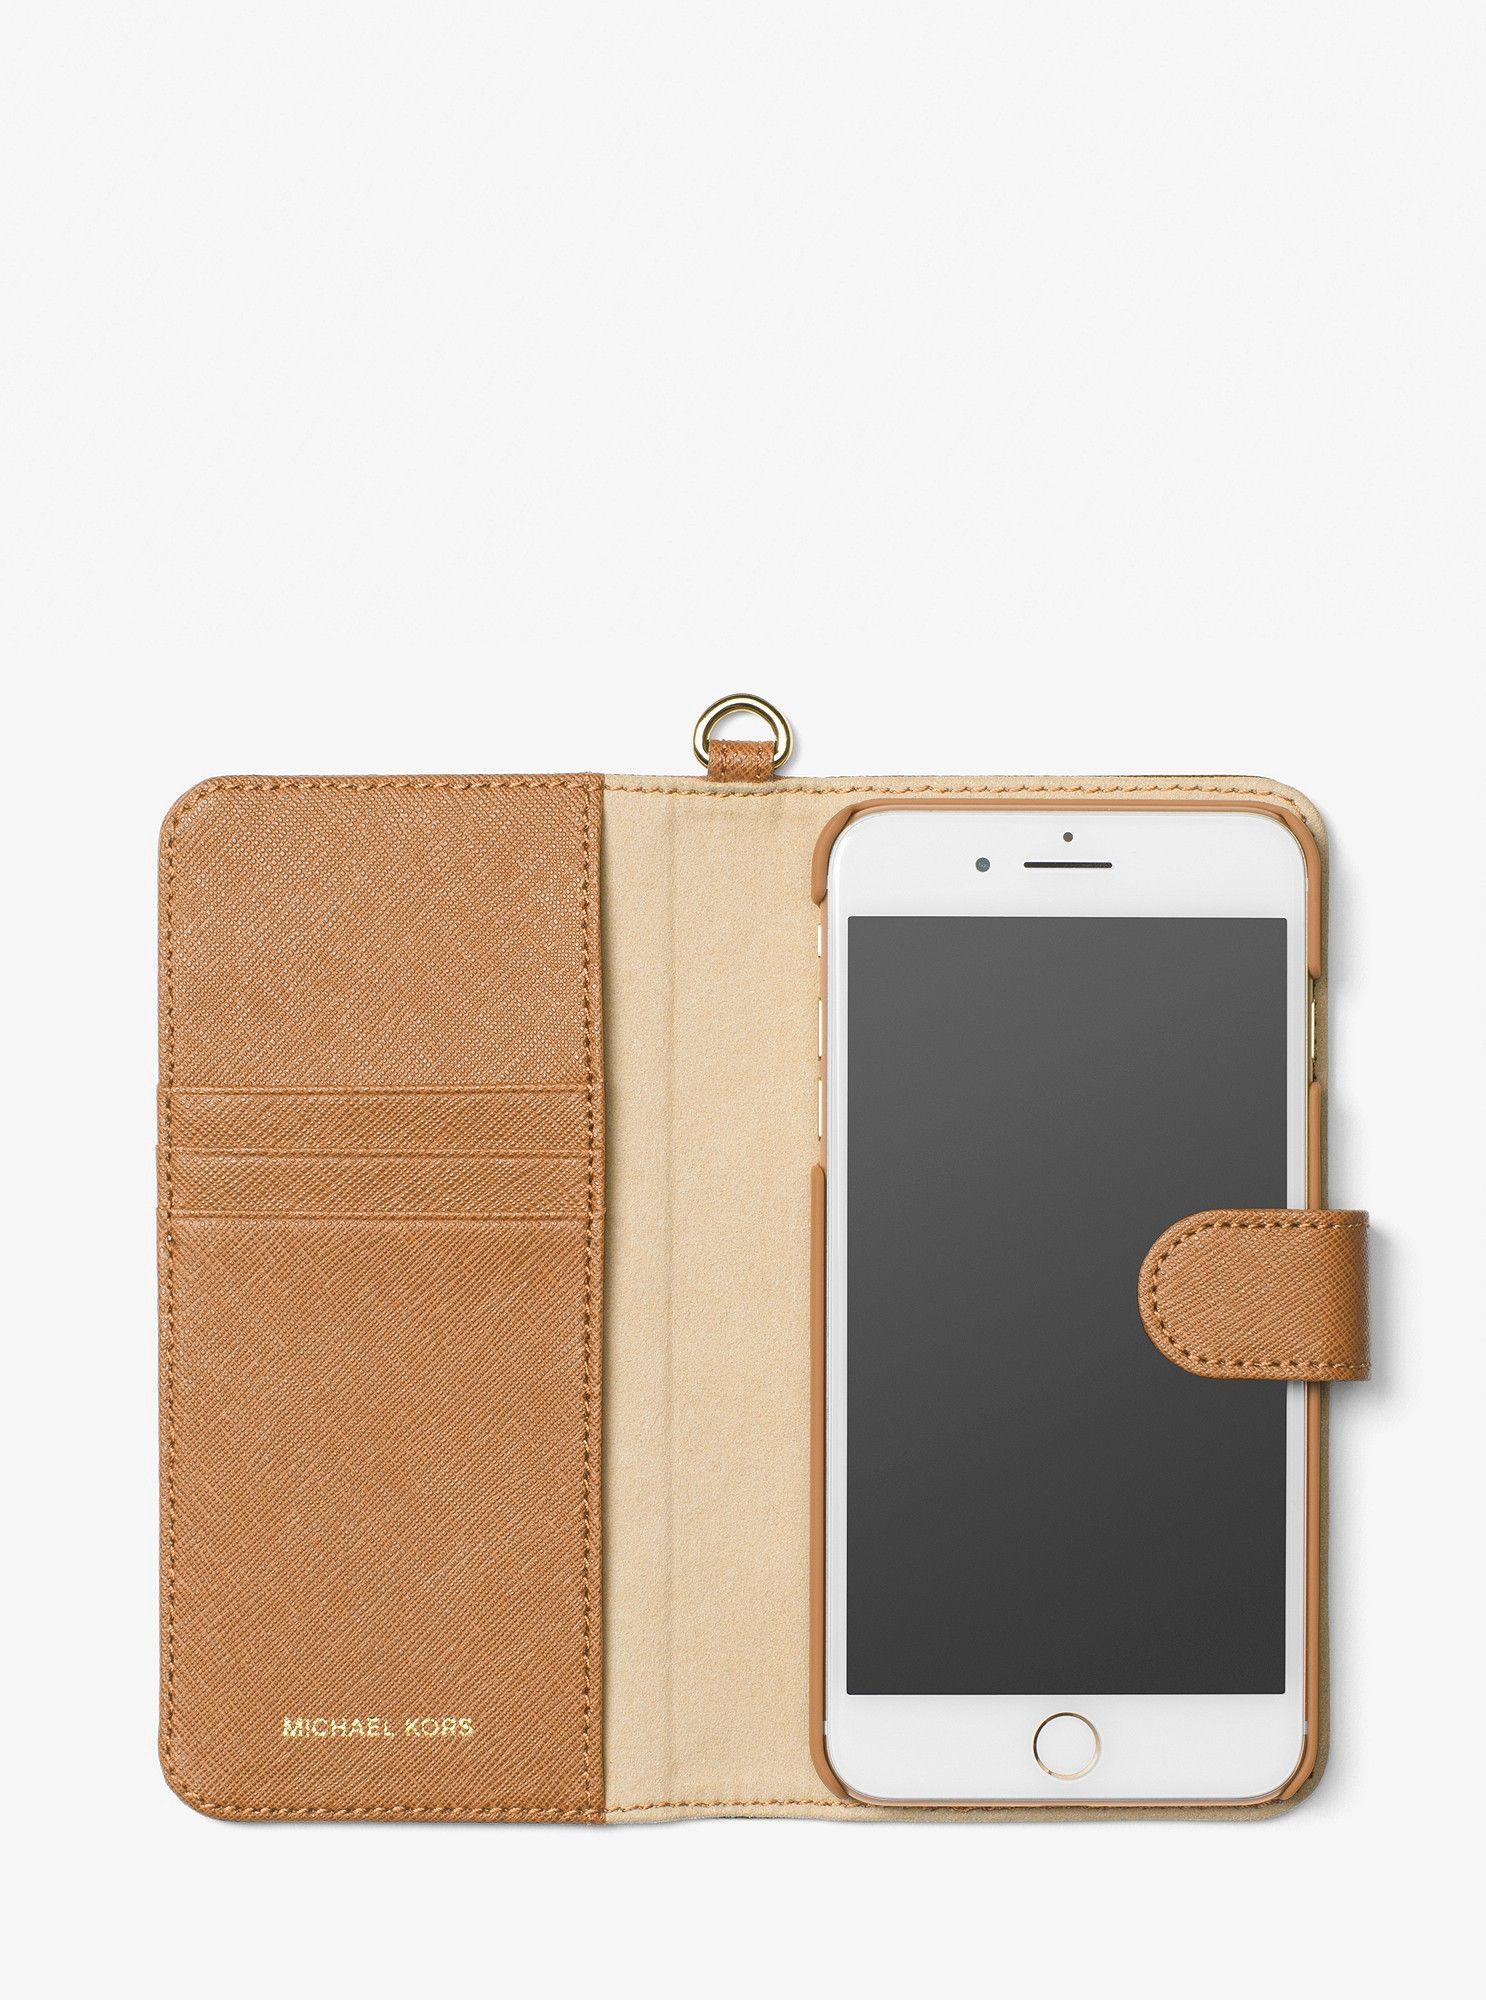 338dc27751b5 Michael Kors Saffiano Leather Folio Phone Case For Iphone7/8 Plus - Black